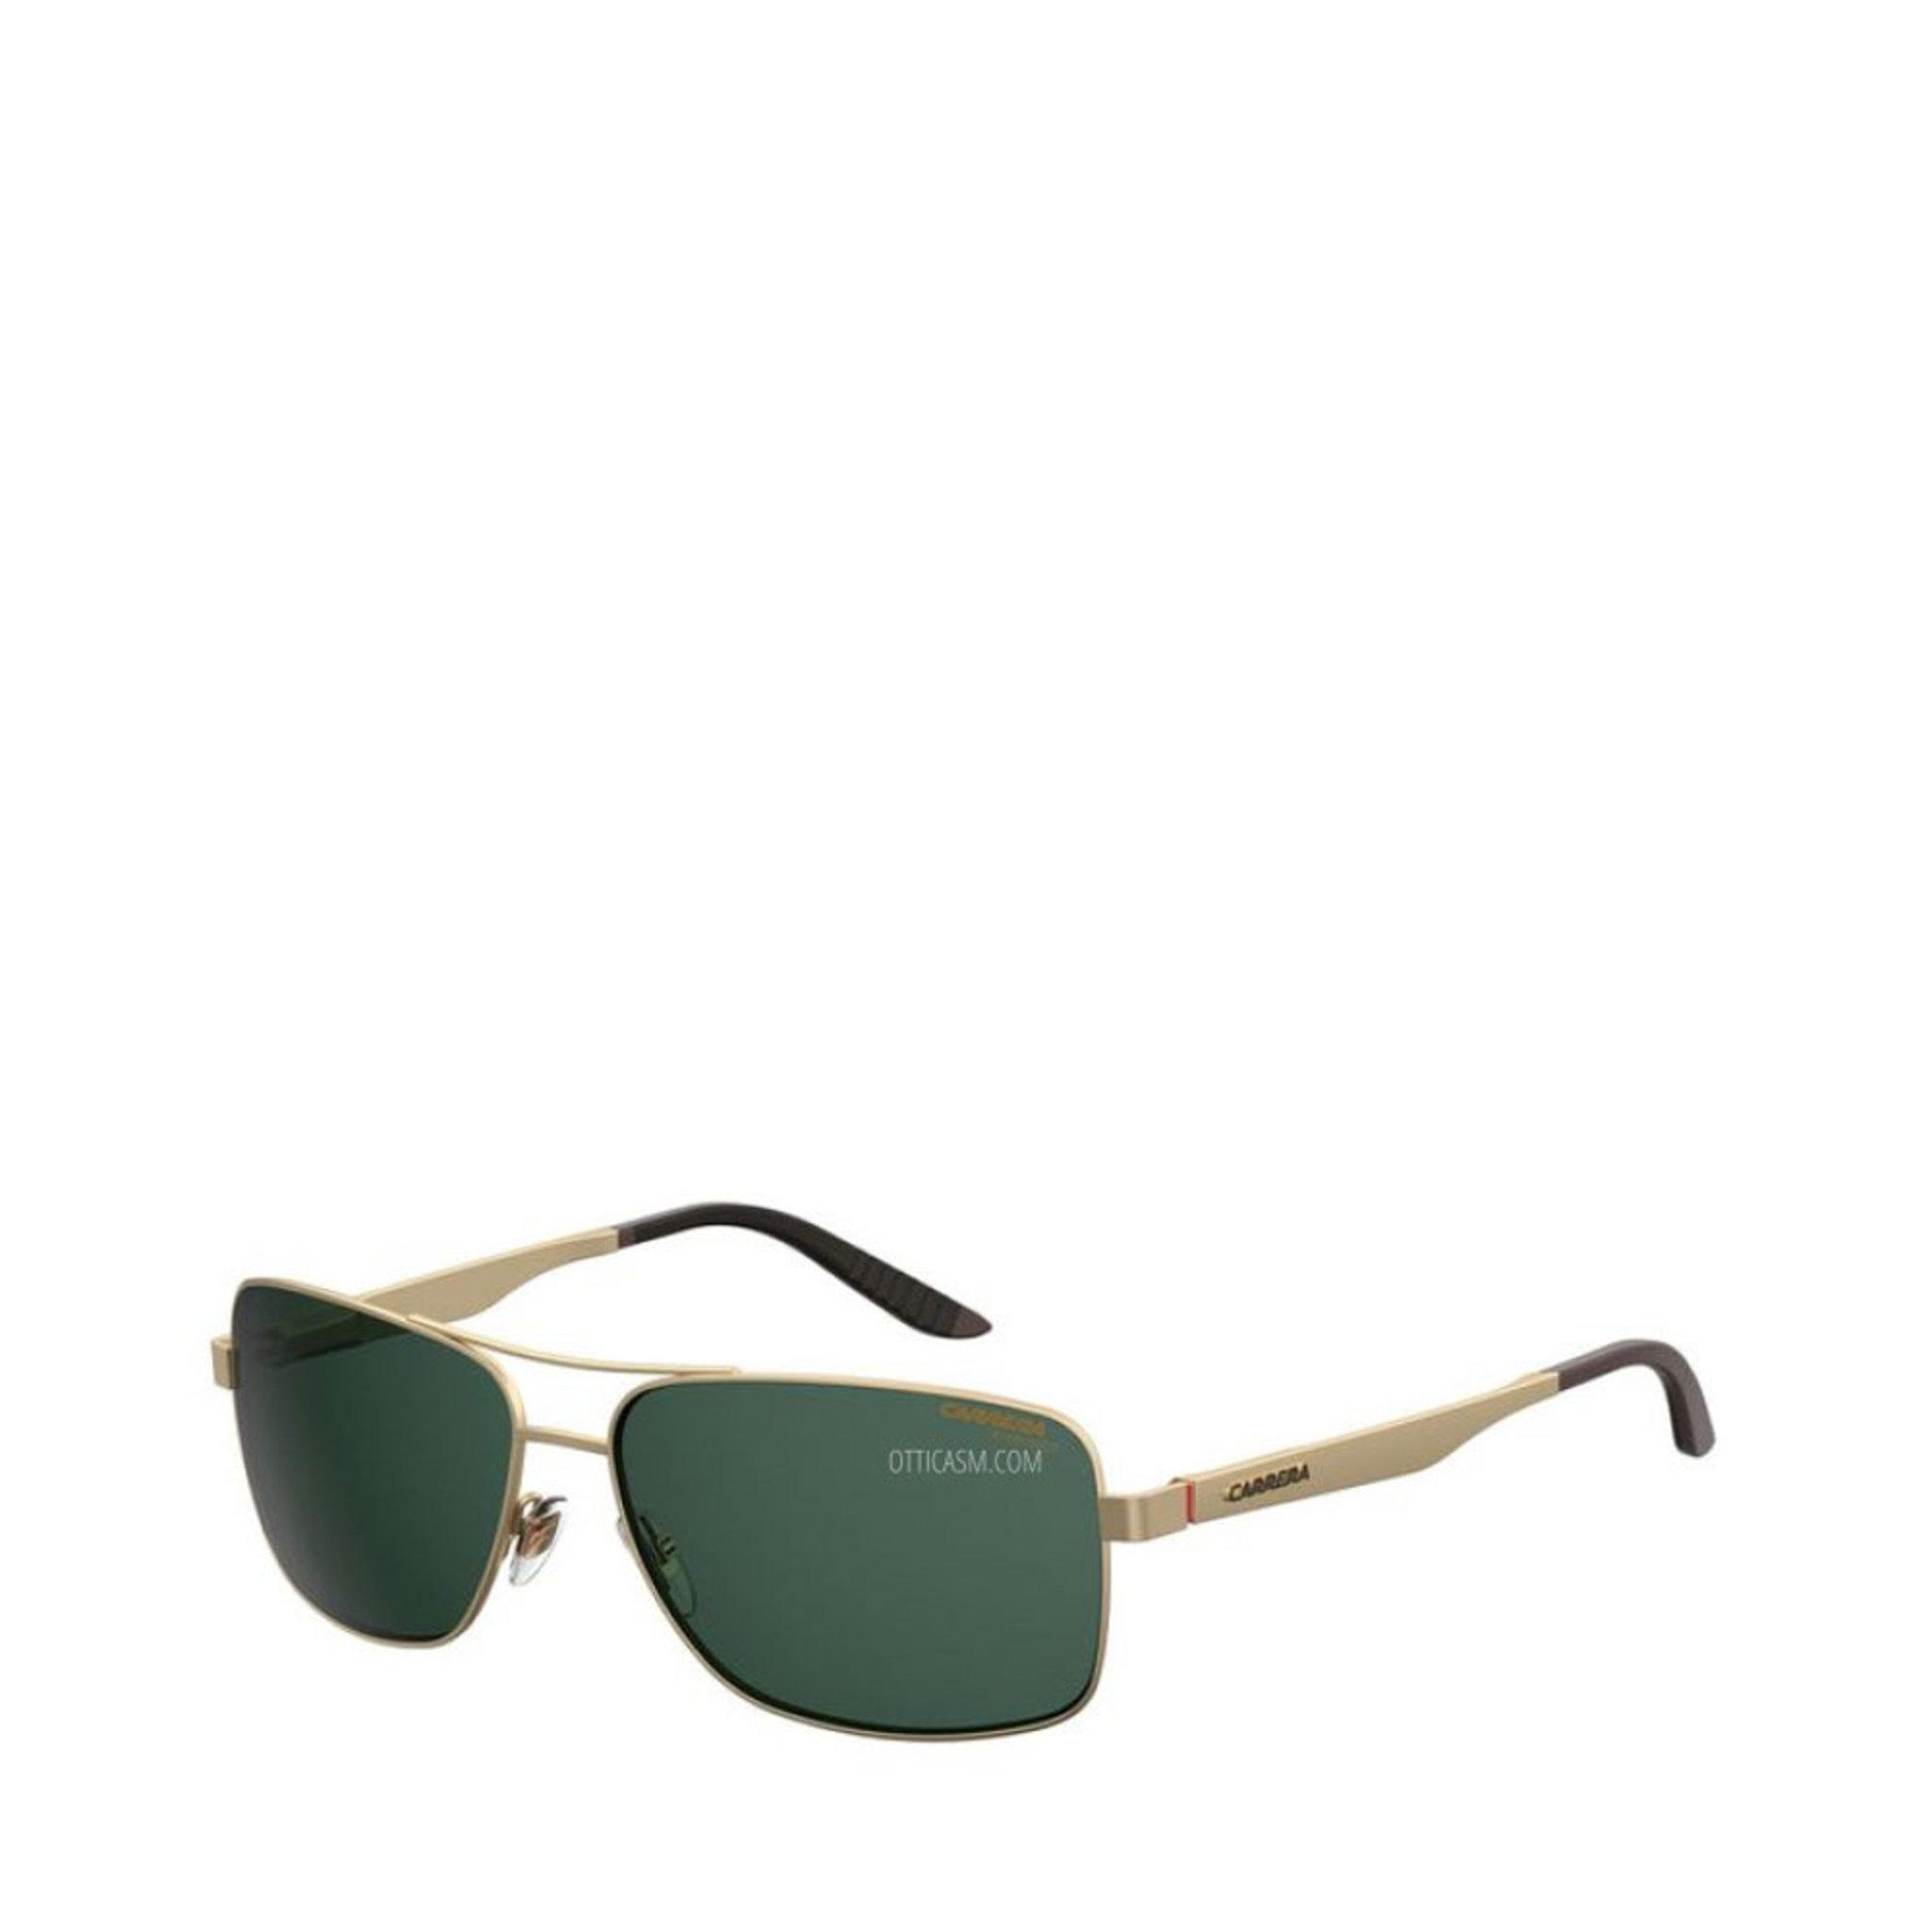 Sunglasses 8014/S, 61